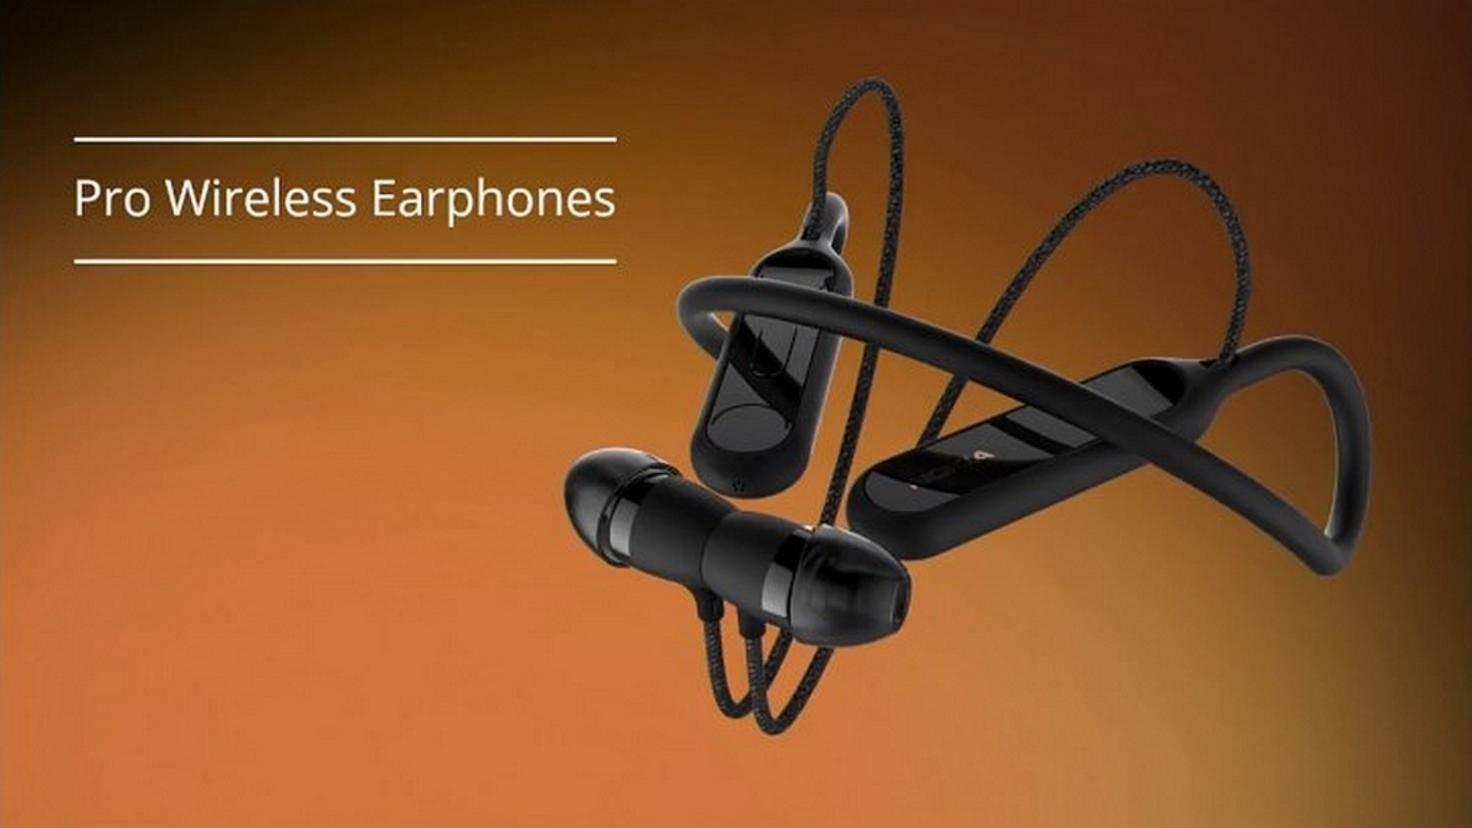 Nokia-Pro-Wireless-Earphones